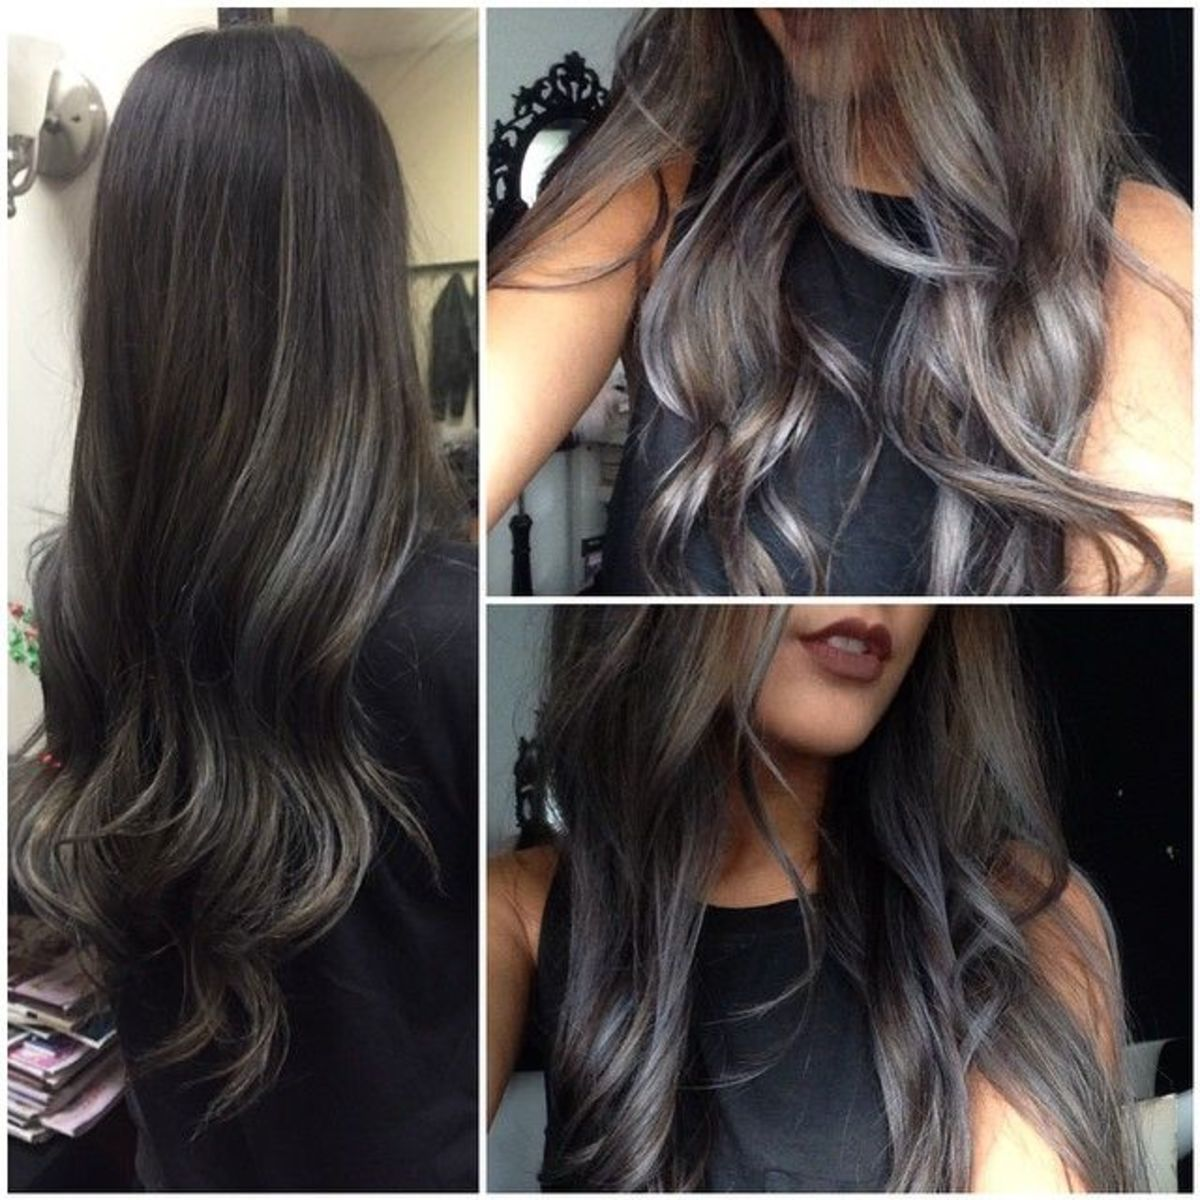 Diy hair 8 ways to rock gray hair bellatory source solutioingenieria Image collections